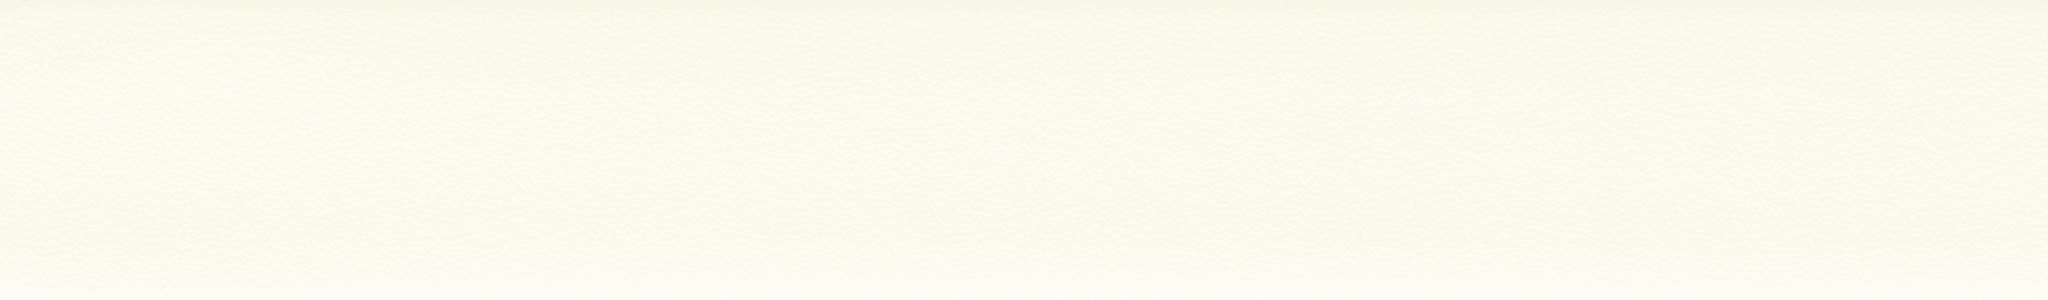 HU 121303 Chant ABS Beige Perle 101